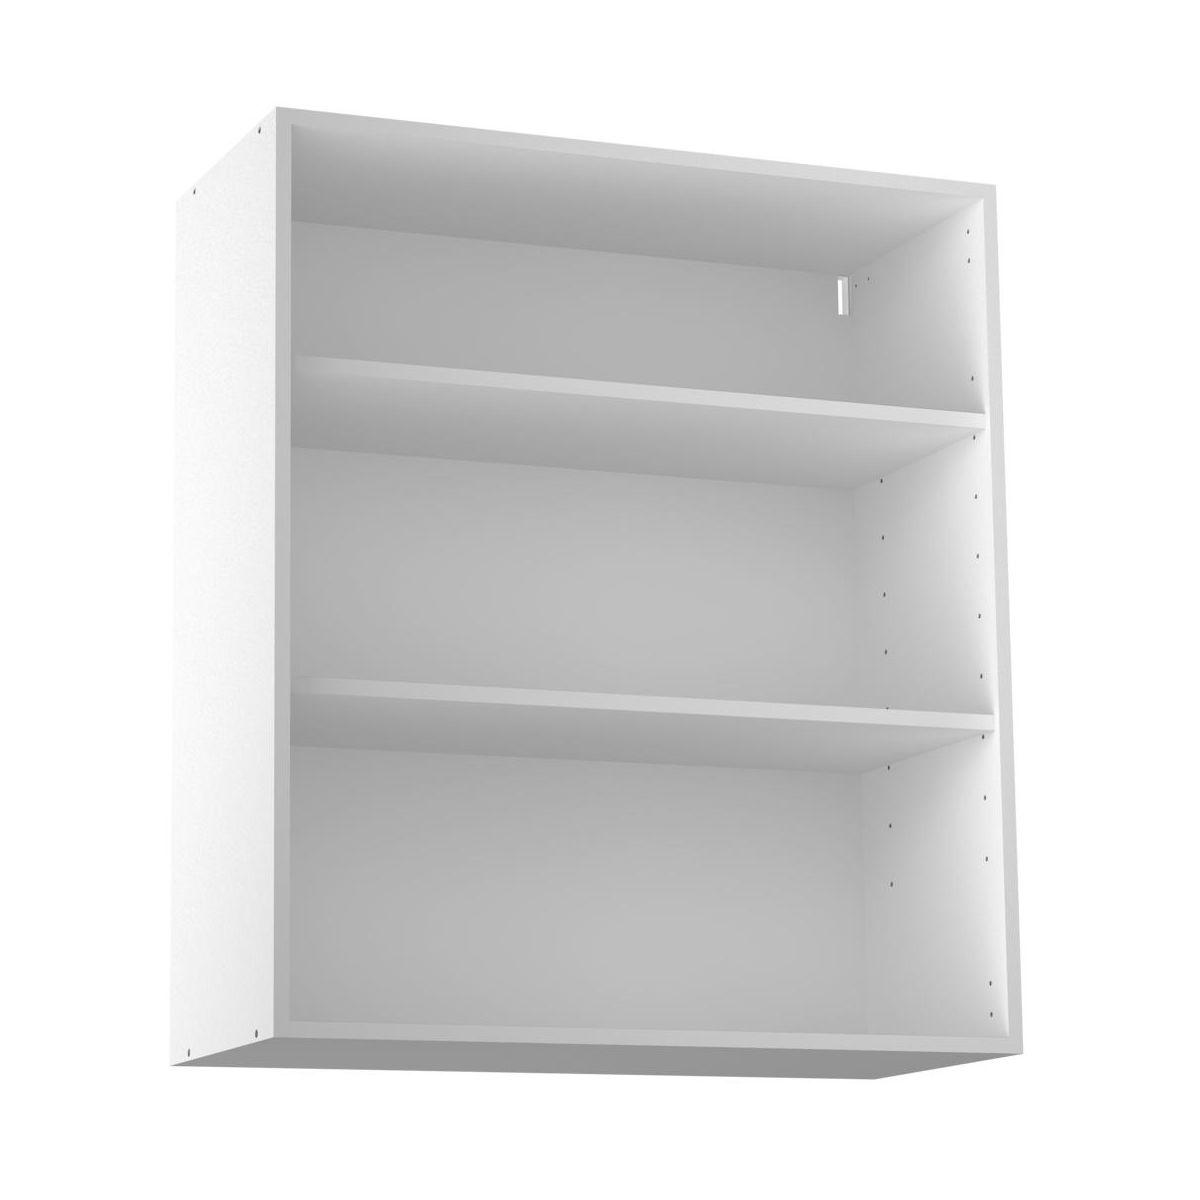 korpus szafki wisz cej h80 92 korpusy delinia w. Black Bedroom Furniture Sets. Home Design Ideas